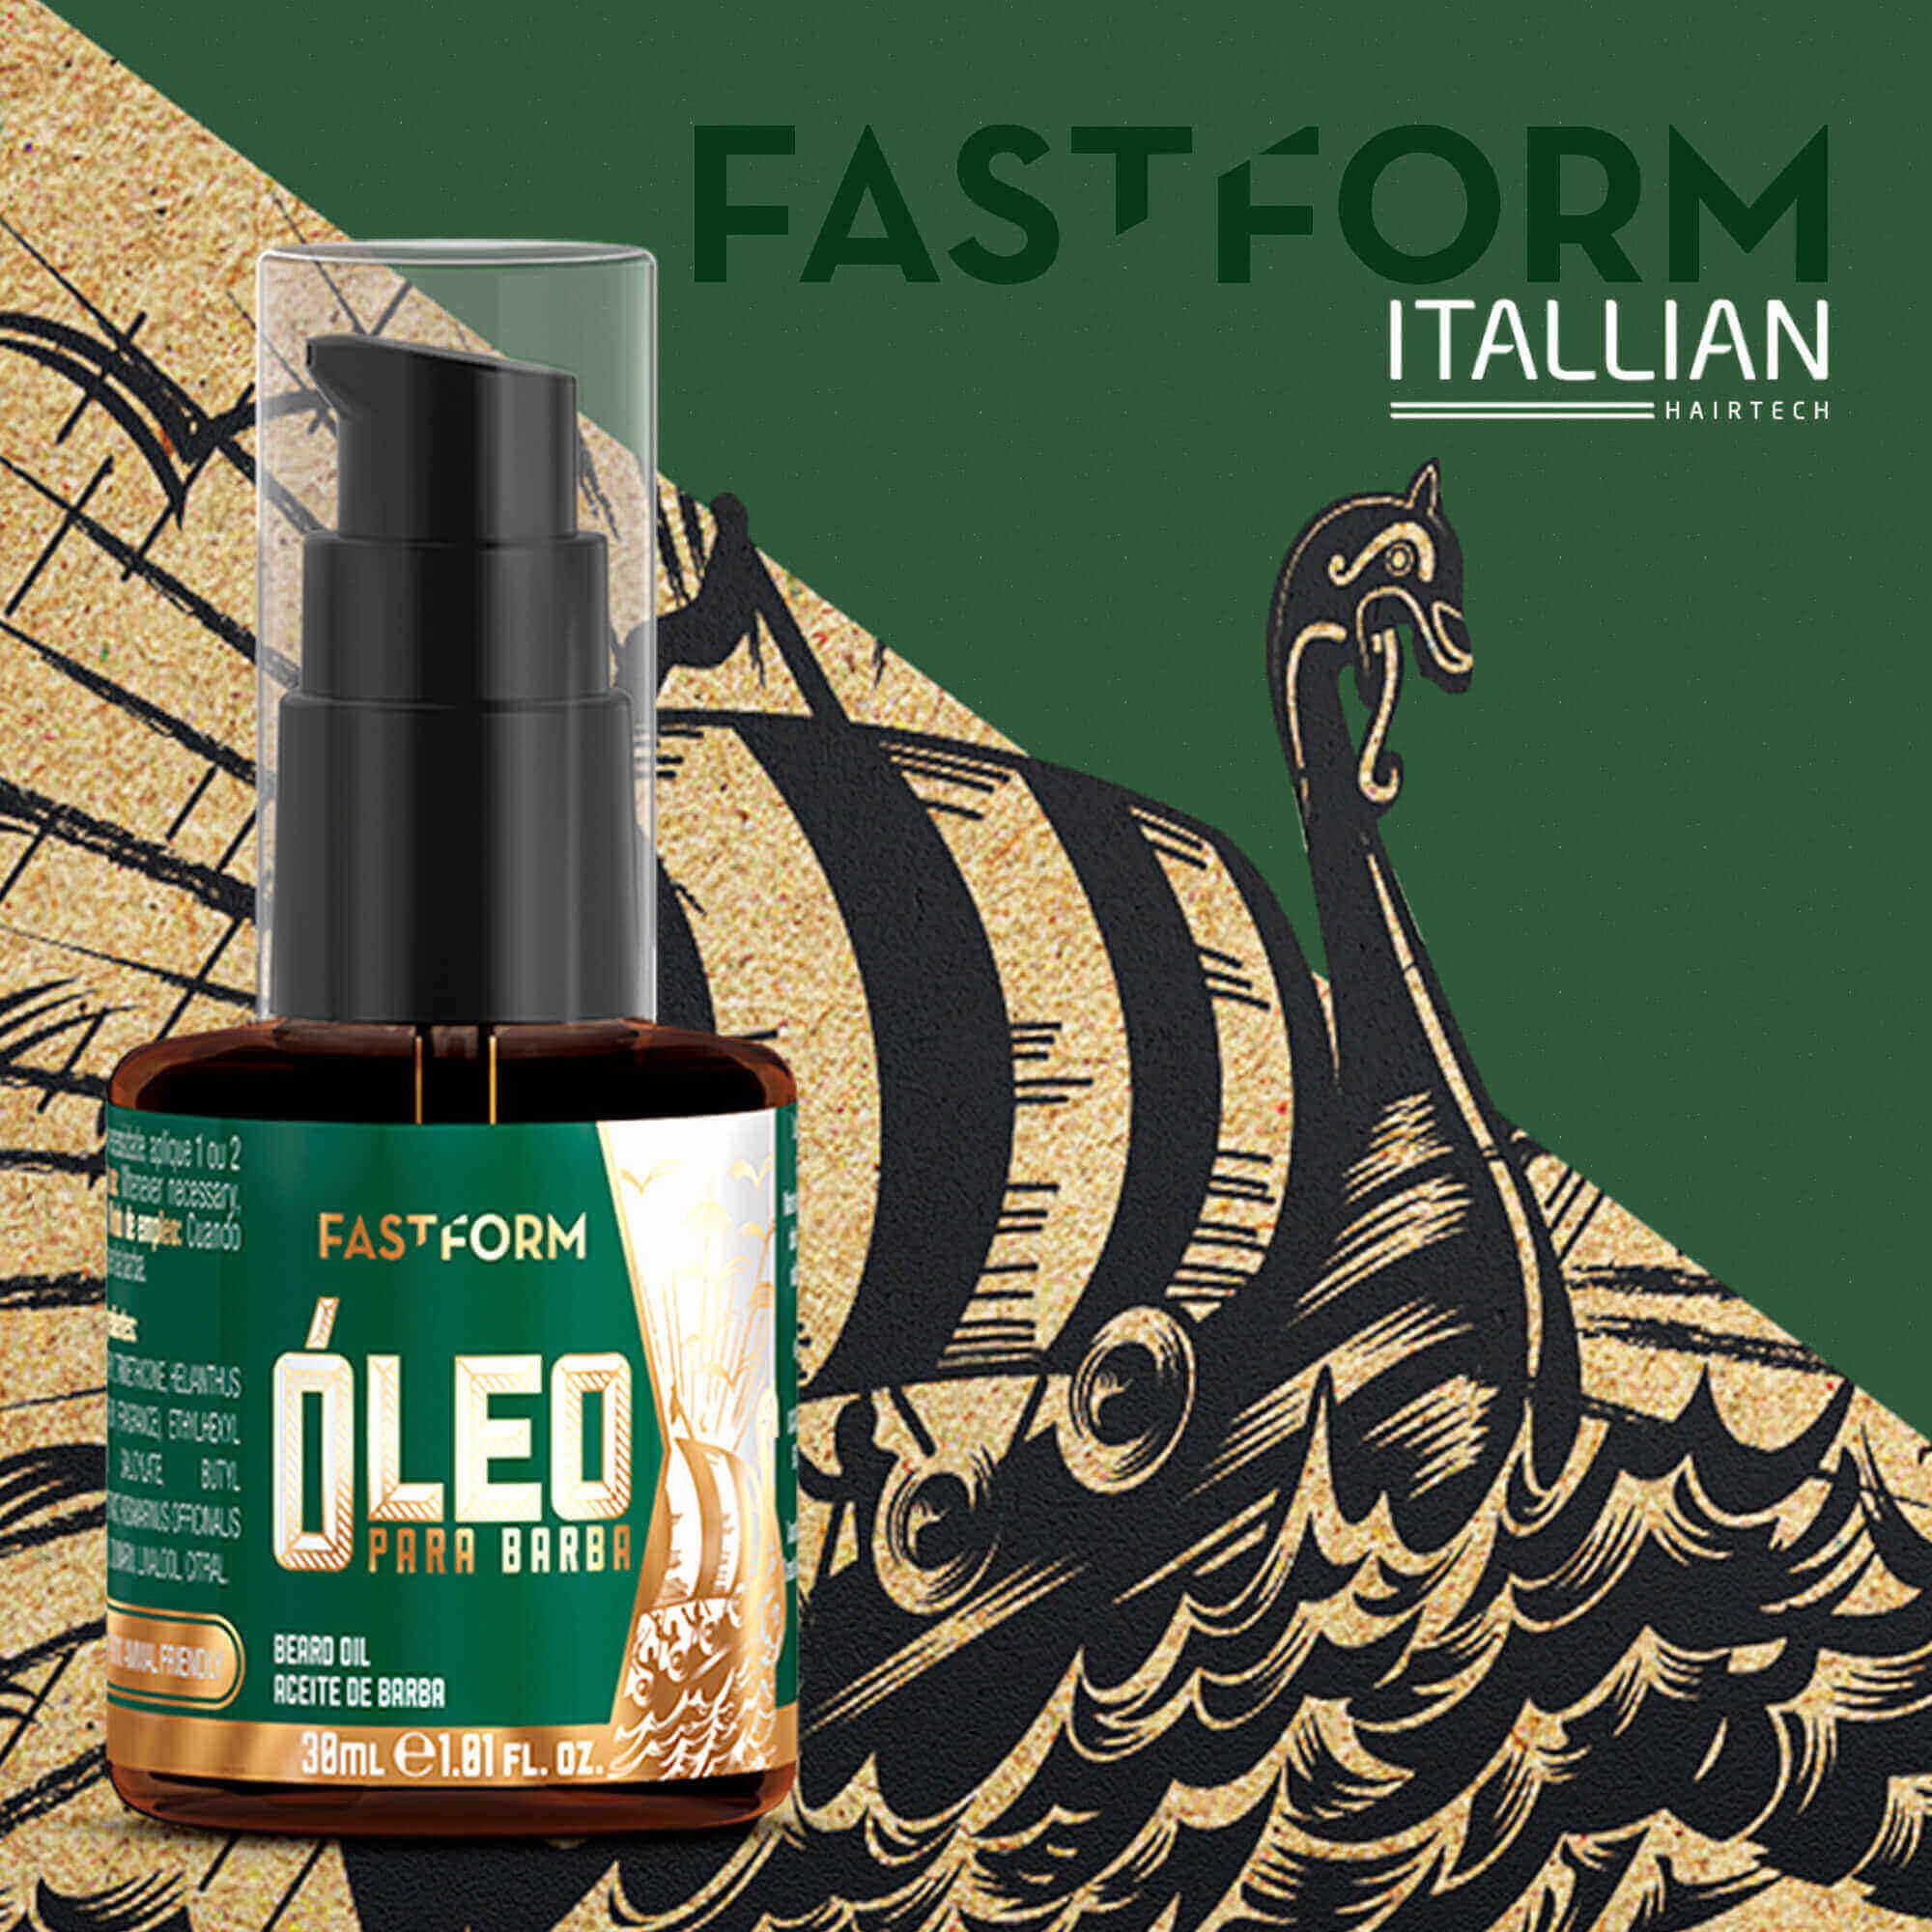 Óleo Para Barba Itallian Fastform 30ml